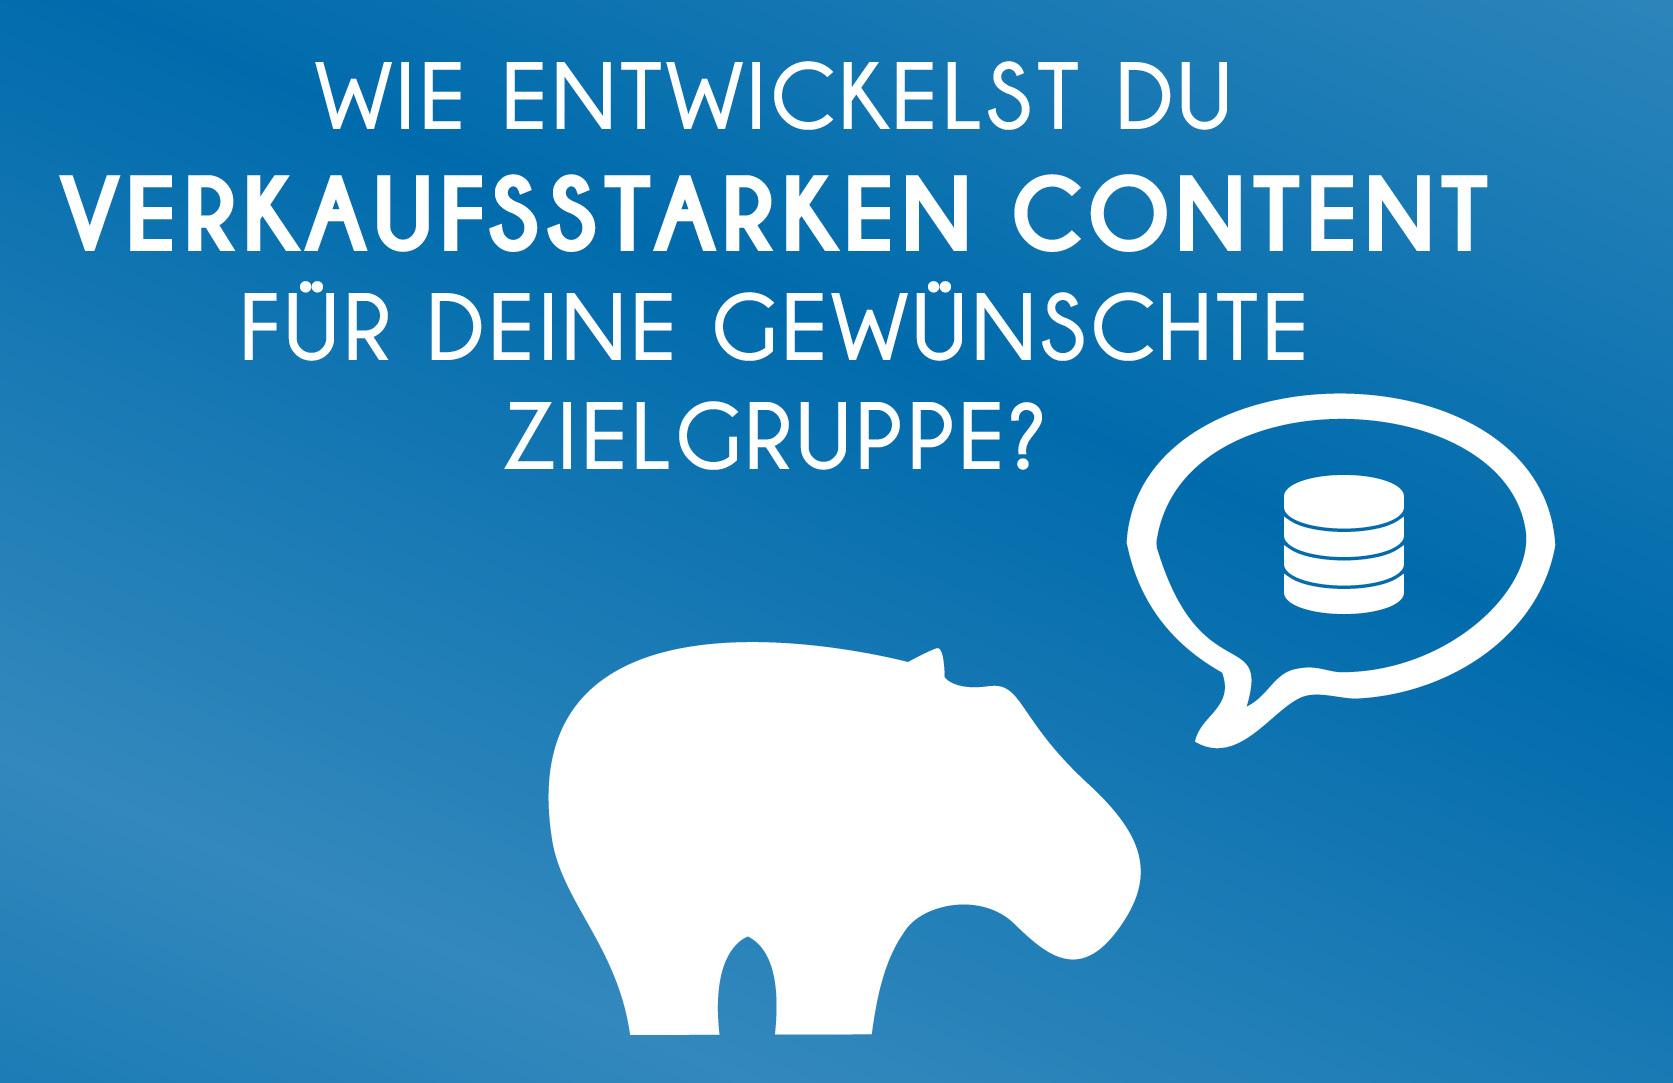 Blue Hippo Marketing Tipp - So erstellst Diu verkaufsstarken Content für Deine Zielgruppen